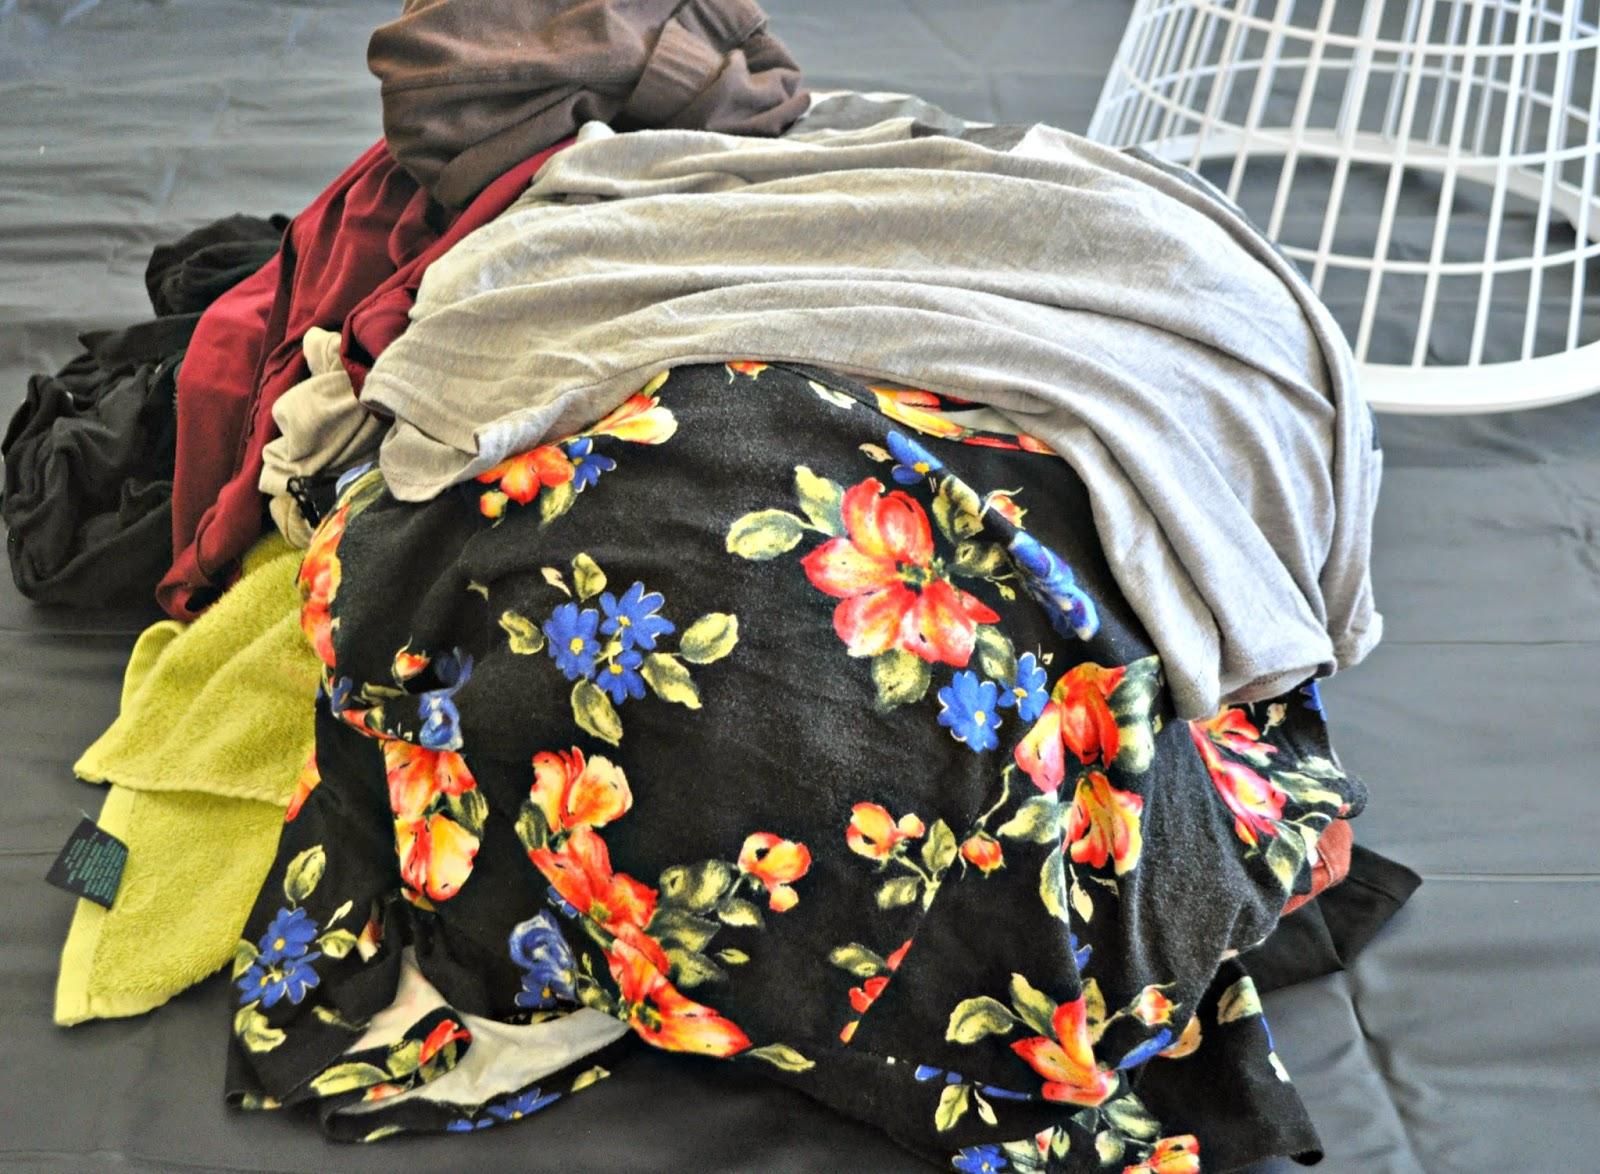 Purex, no sort, clean clothes, forever 21 floral peplum top